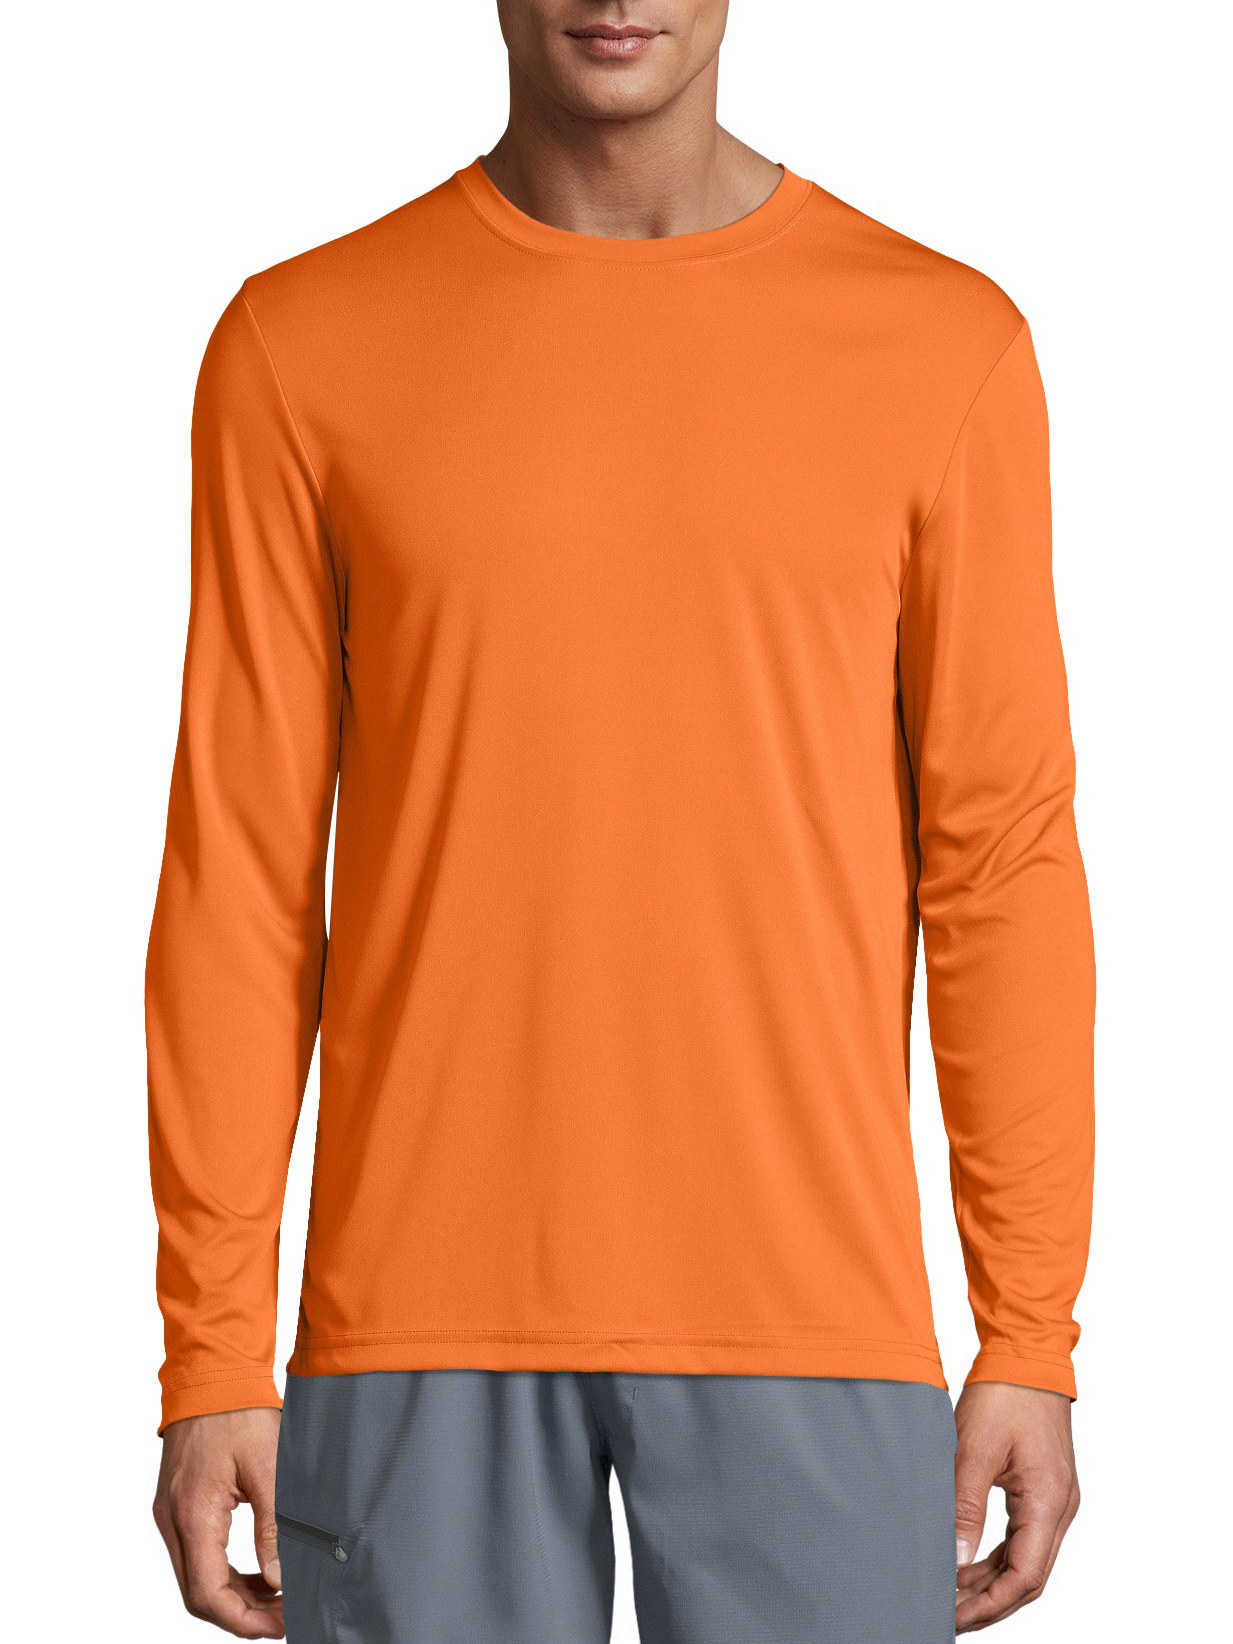 person wearing an orange long sleeve t shirt